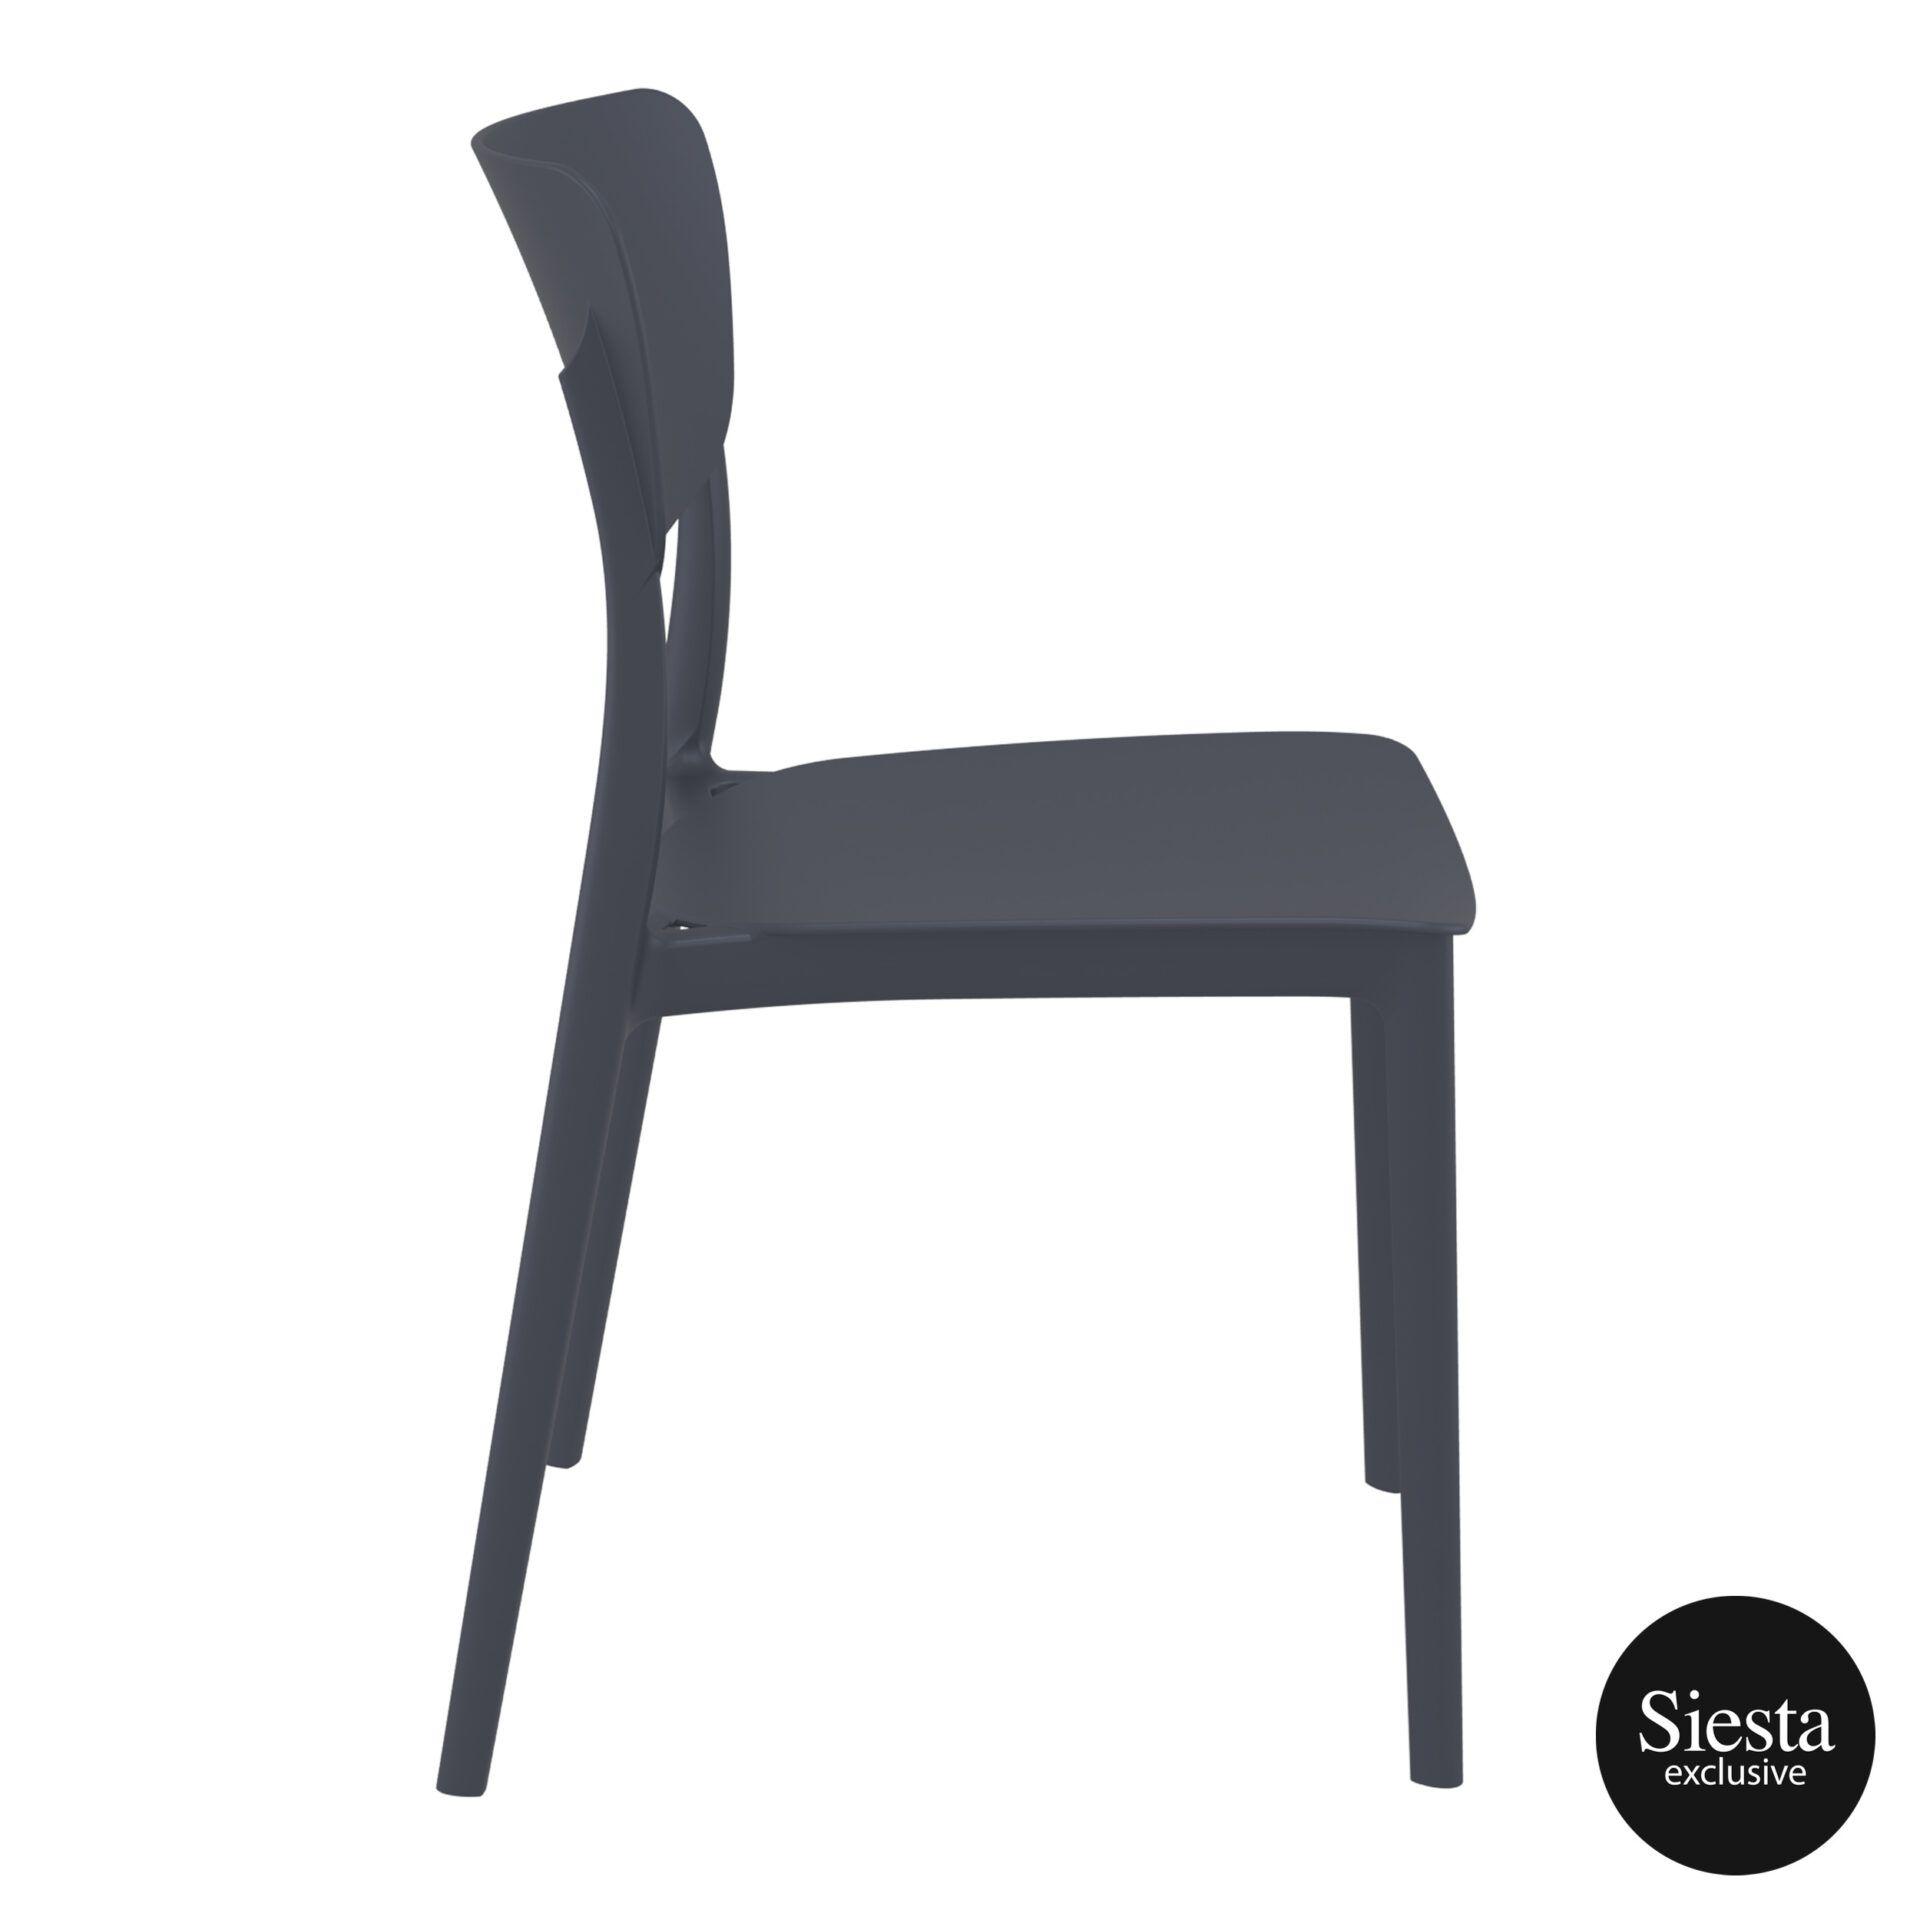 polypropylene outdoor dining monna chair darkgrey side 2